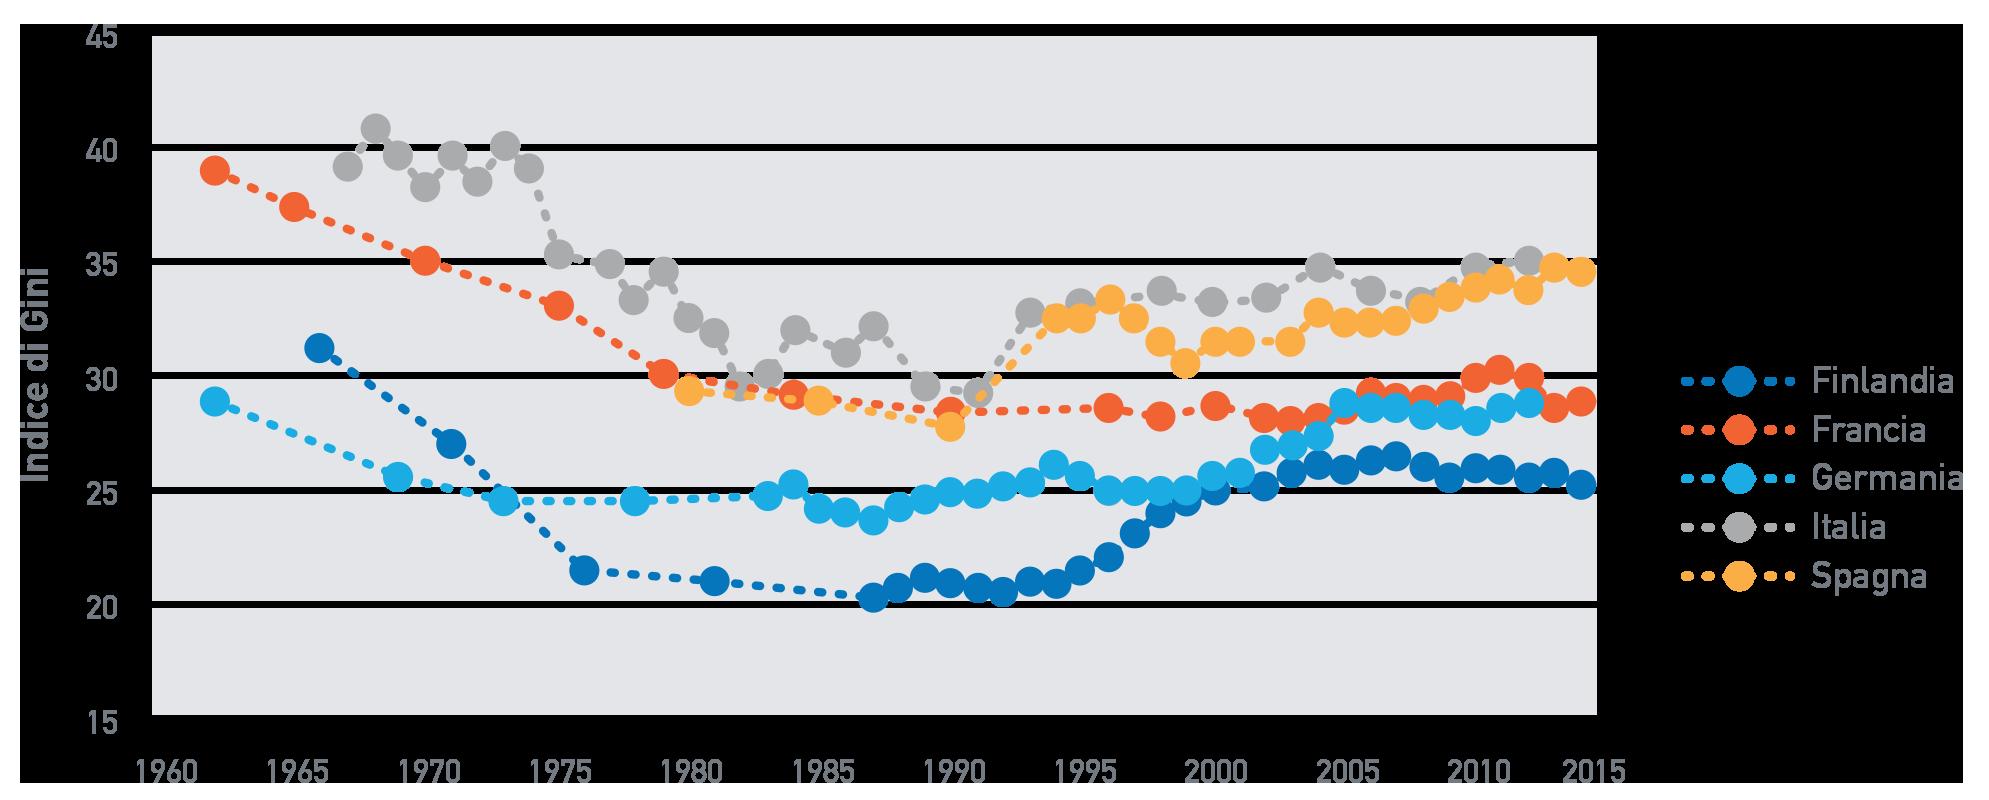 Fig. A.4: Disuguaglianza in alcuni paesi europei, 1960 – 2015